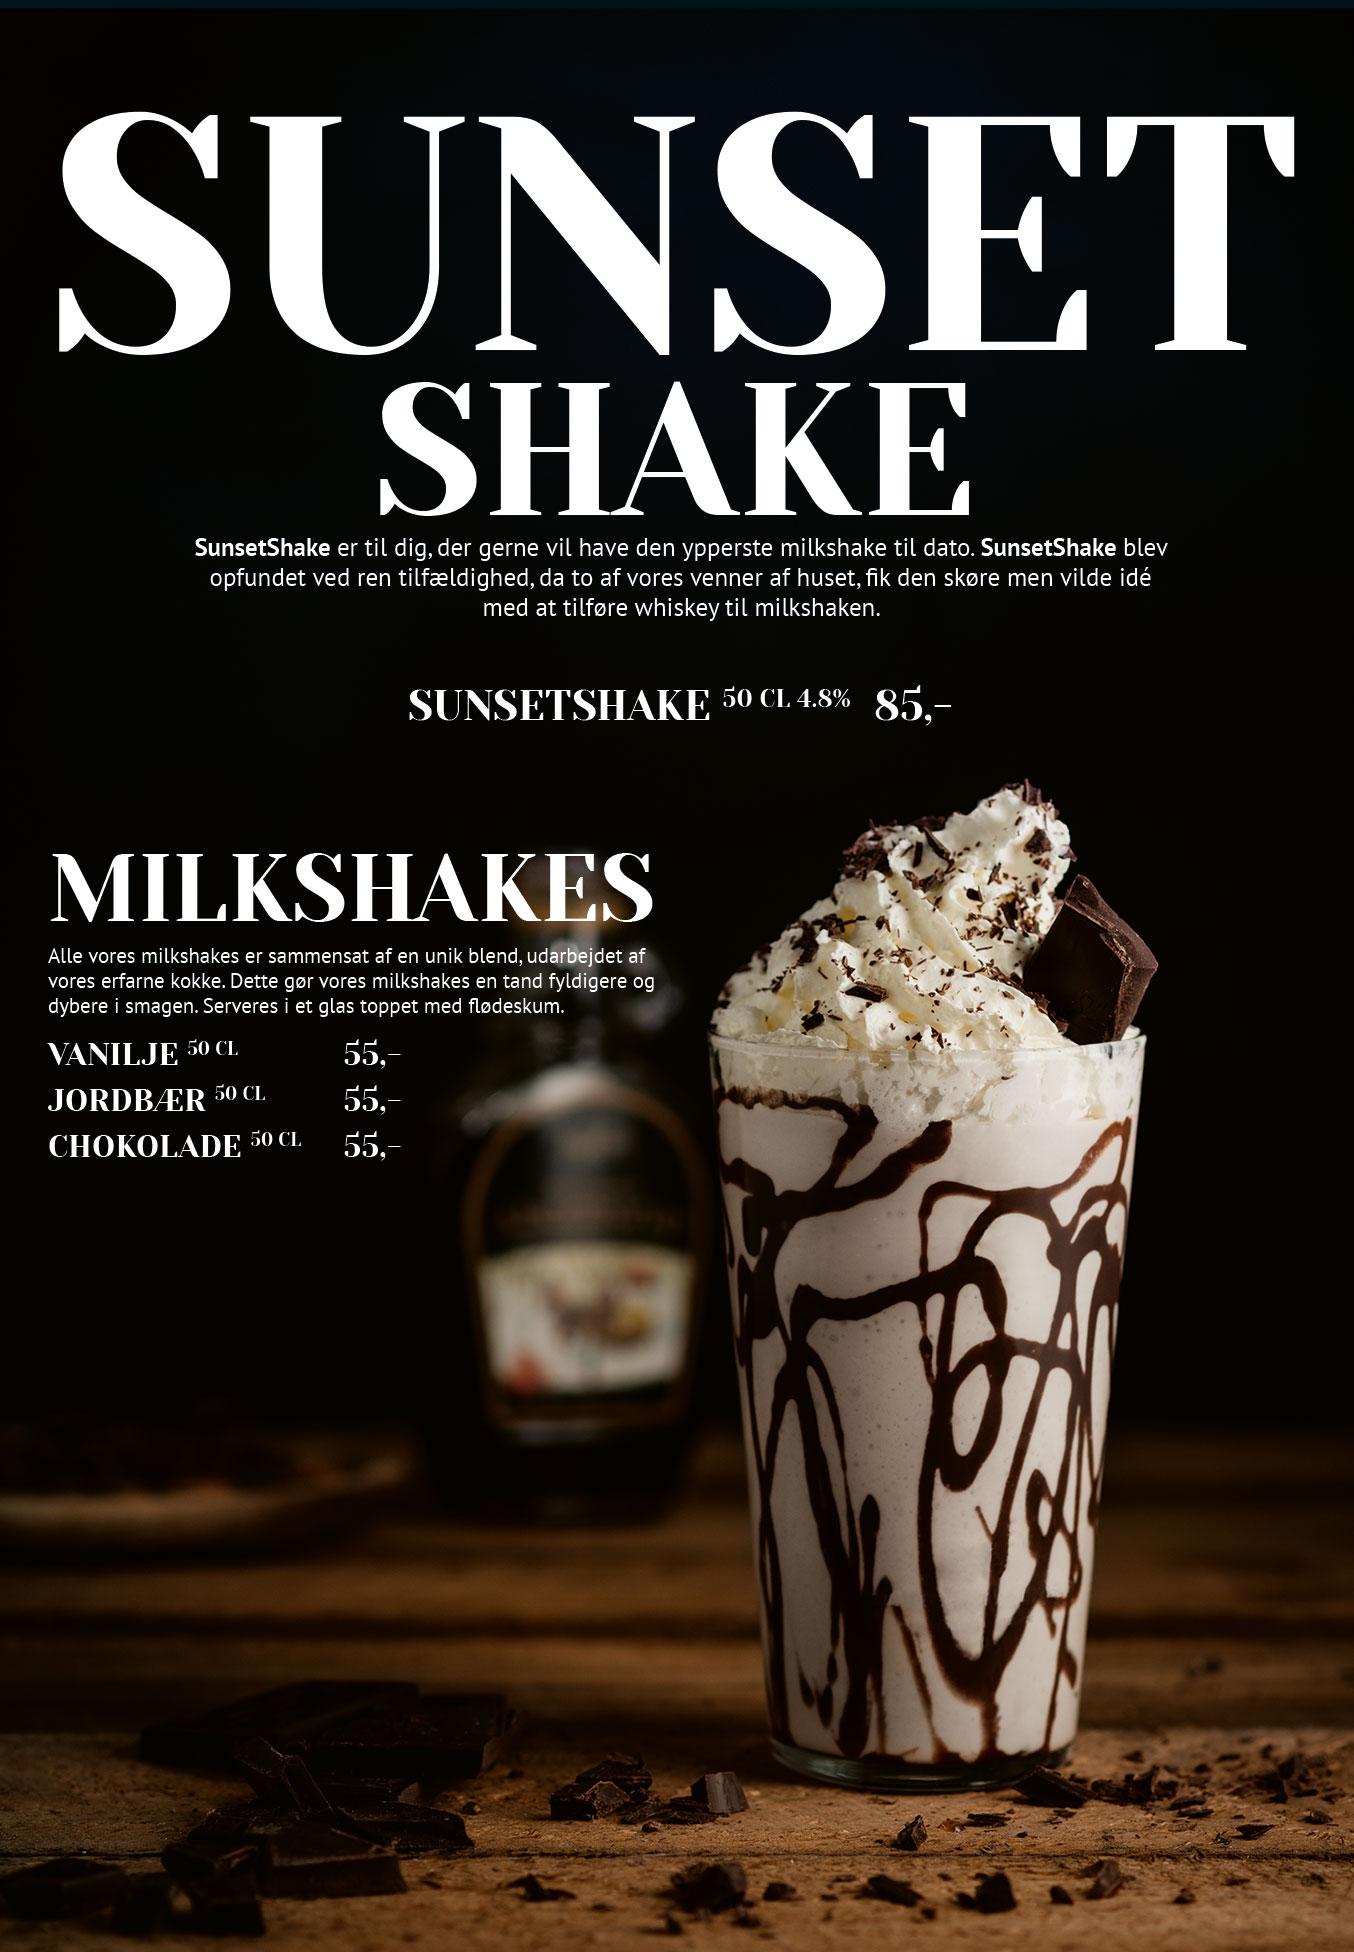 Side 8: Milkshakes